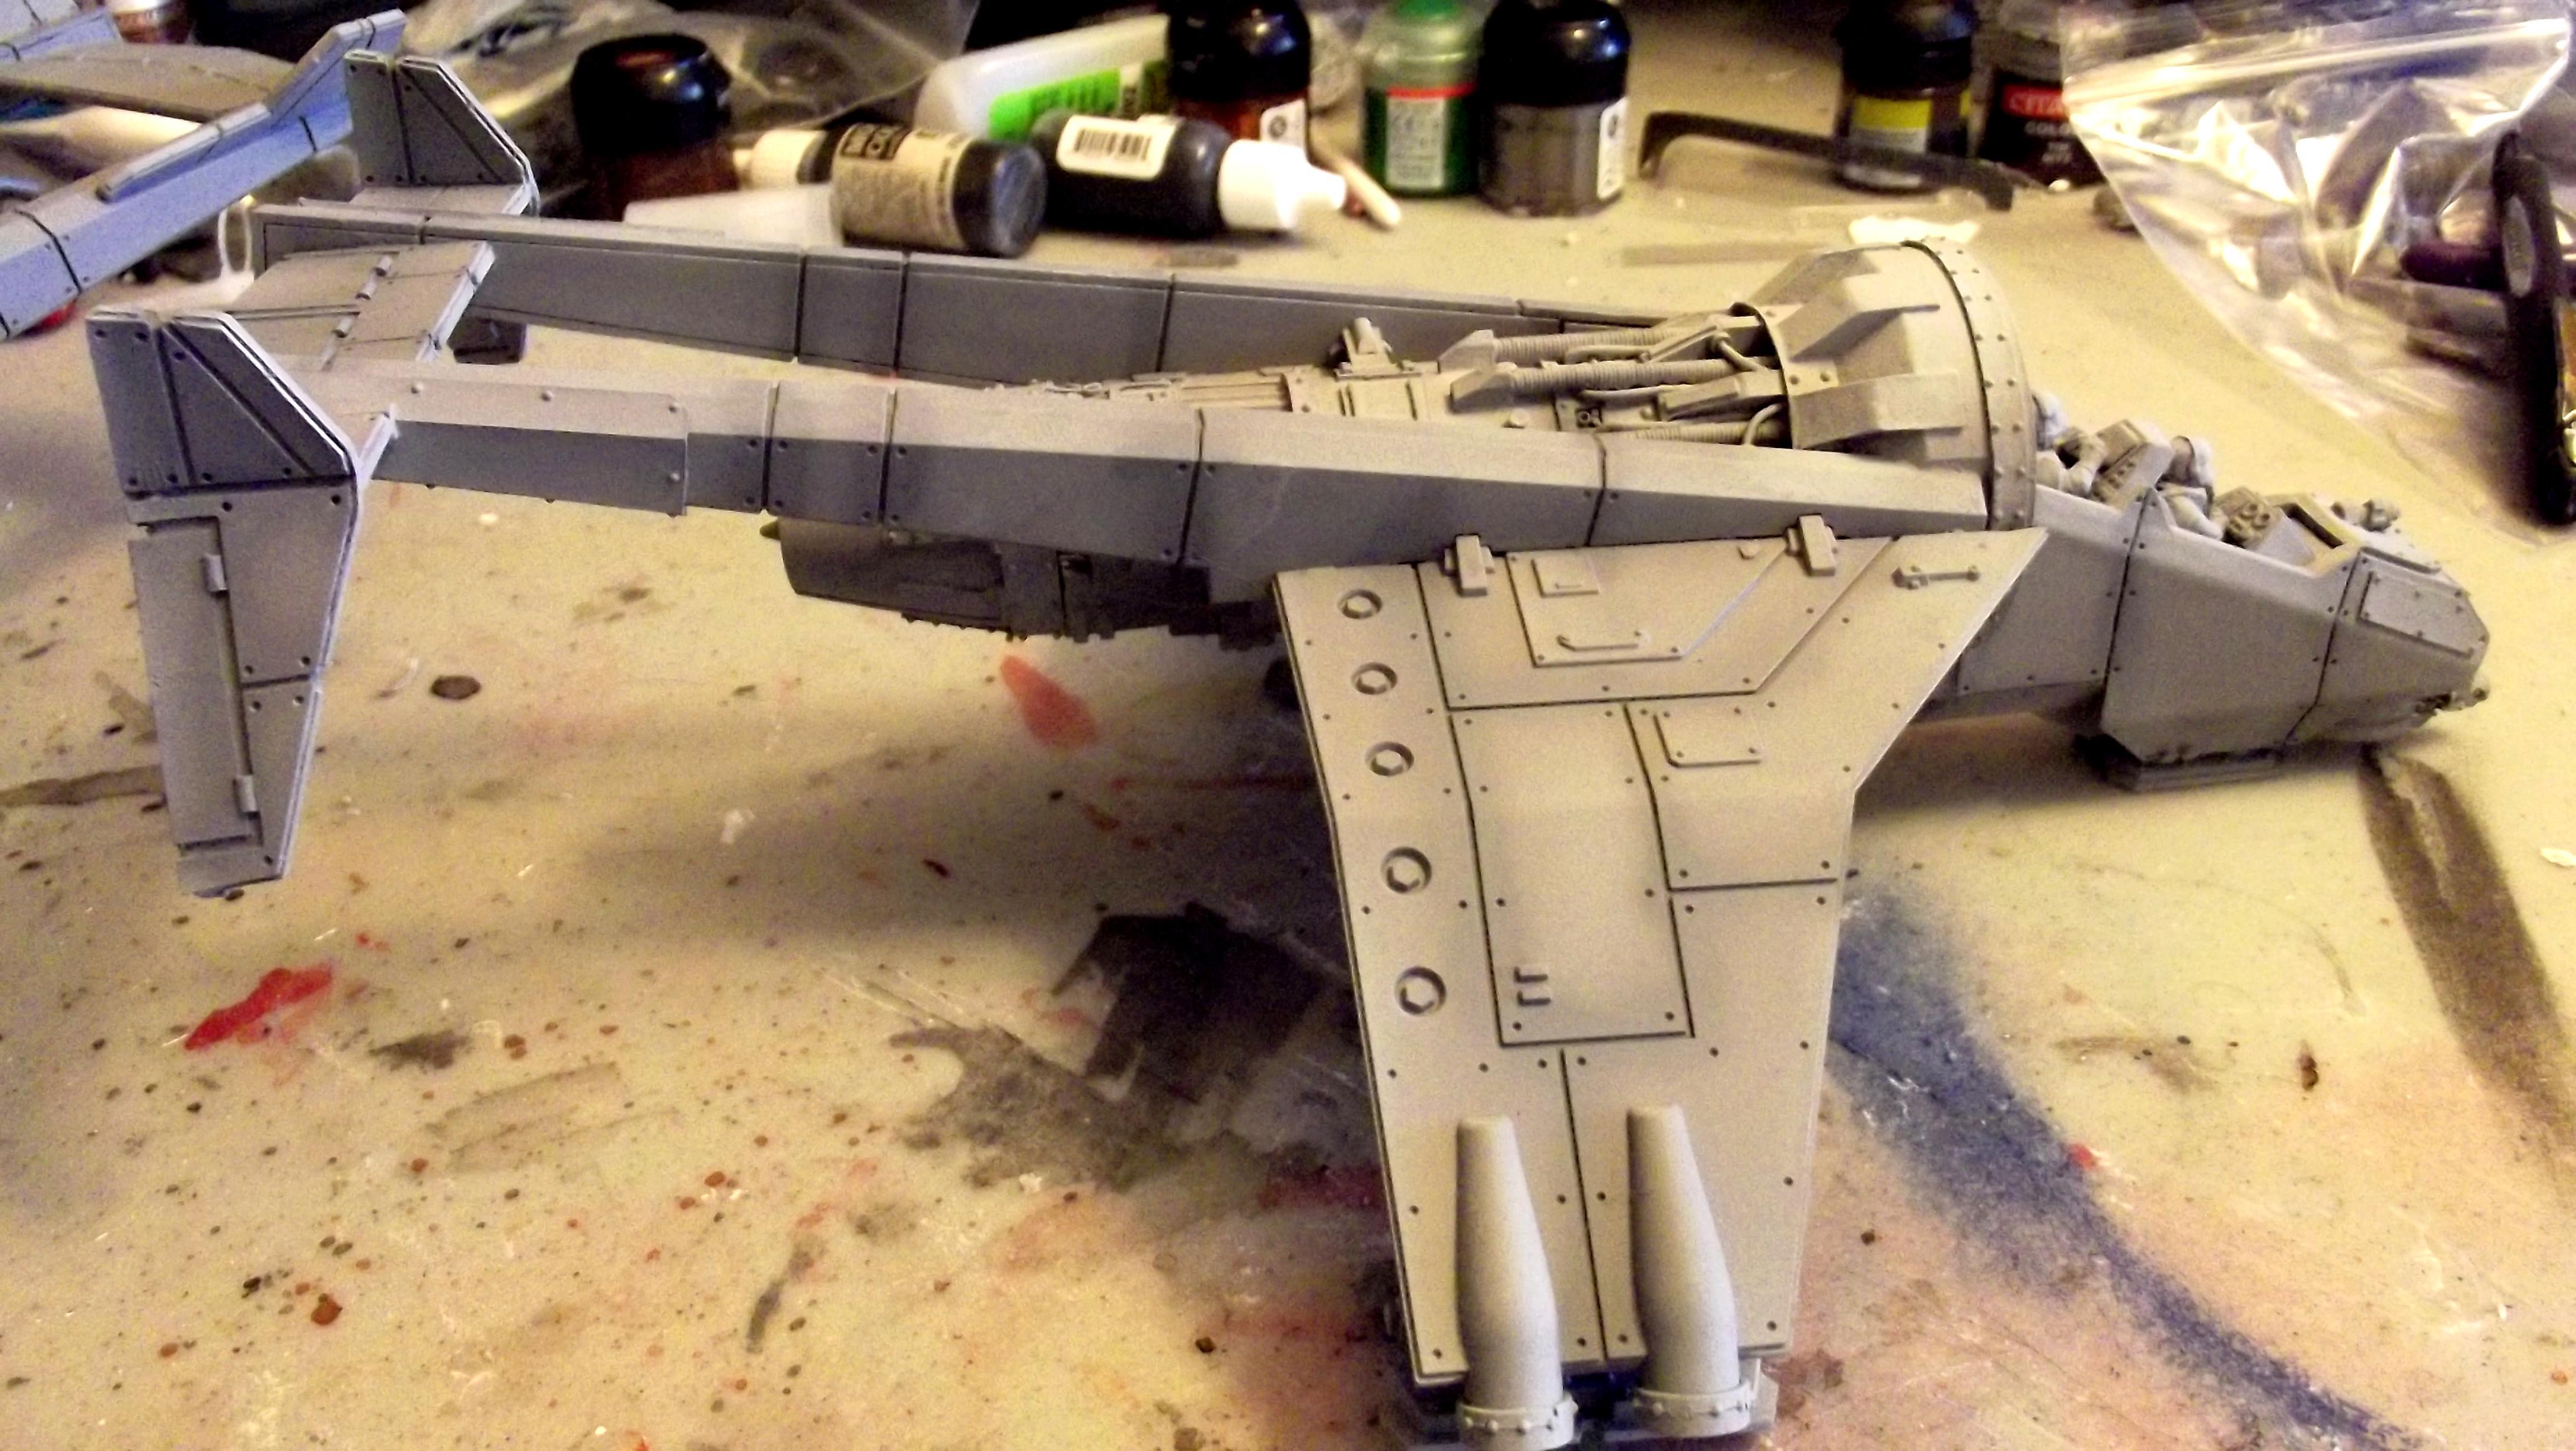 Imperial, Navy, Vulture, Work In Progress